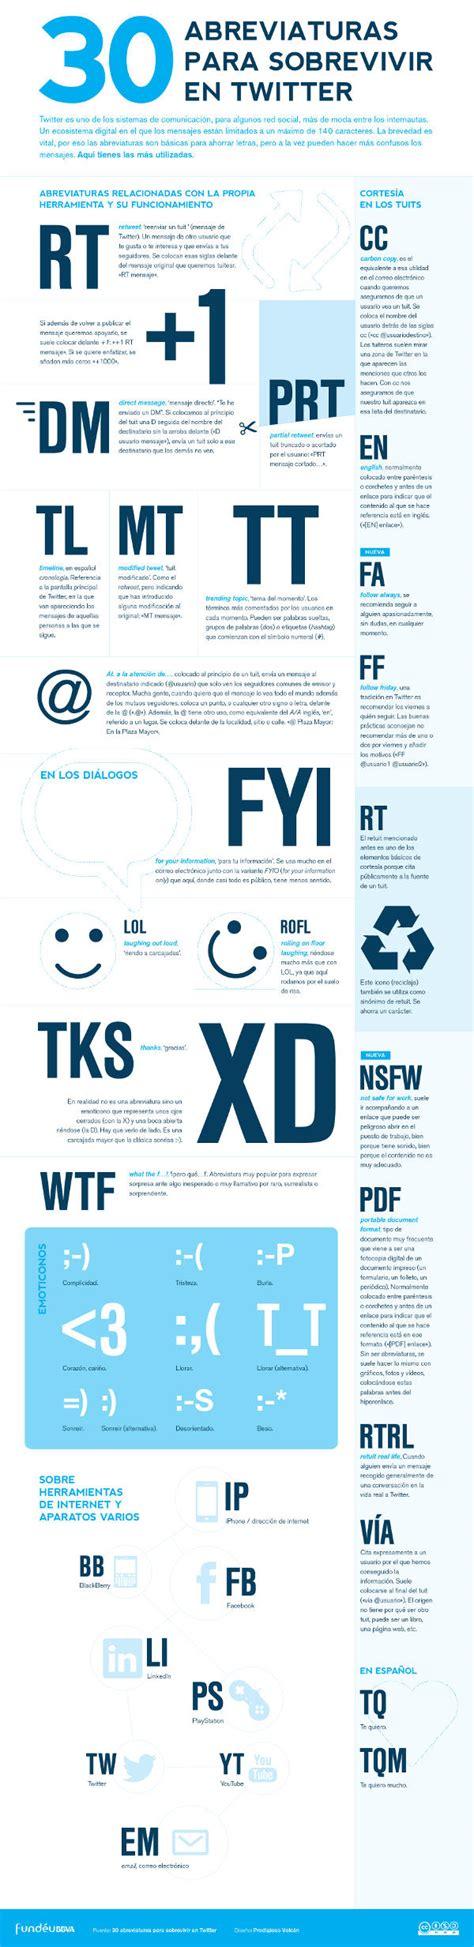 30 abreviaturas para sobrevivir en Twitter | Fundéu BBVA